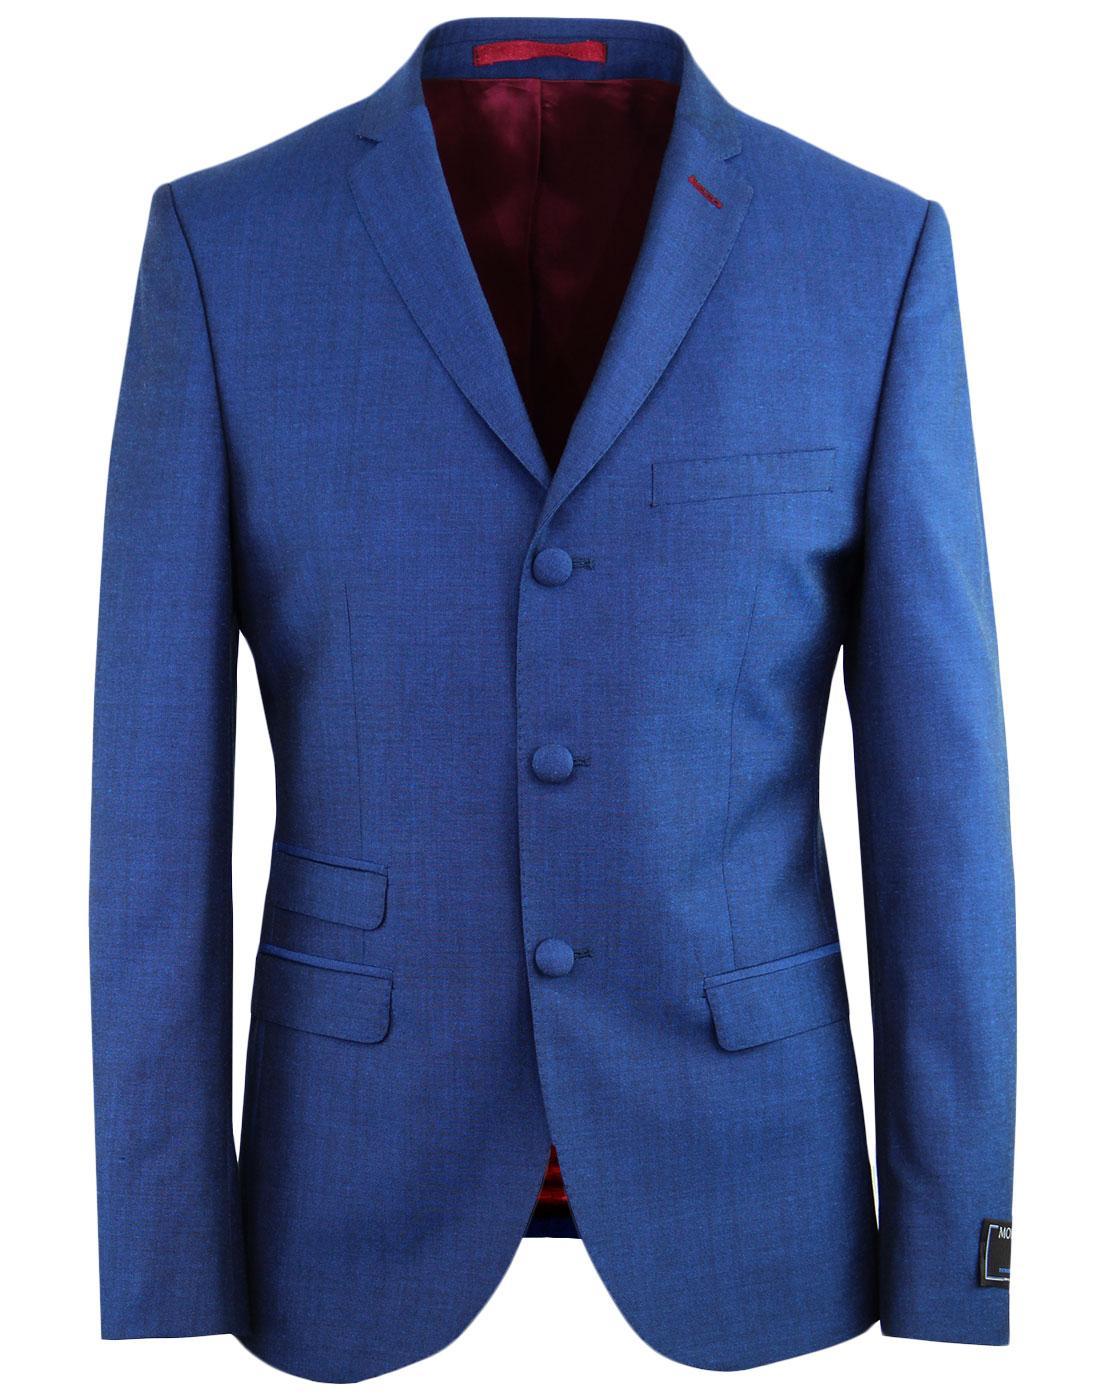 MADCAP ENGLAND Mod Mohair Tonic Blazer BRIGHT BLUE